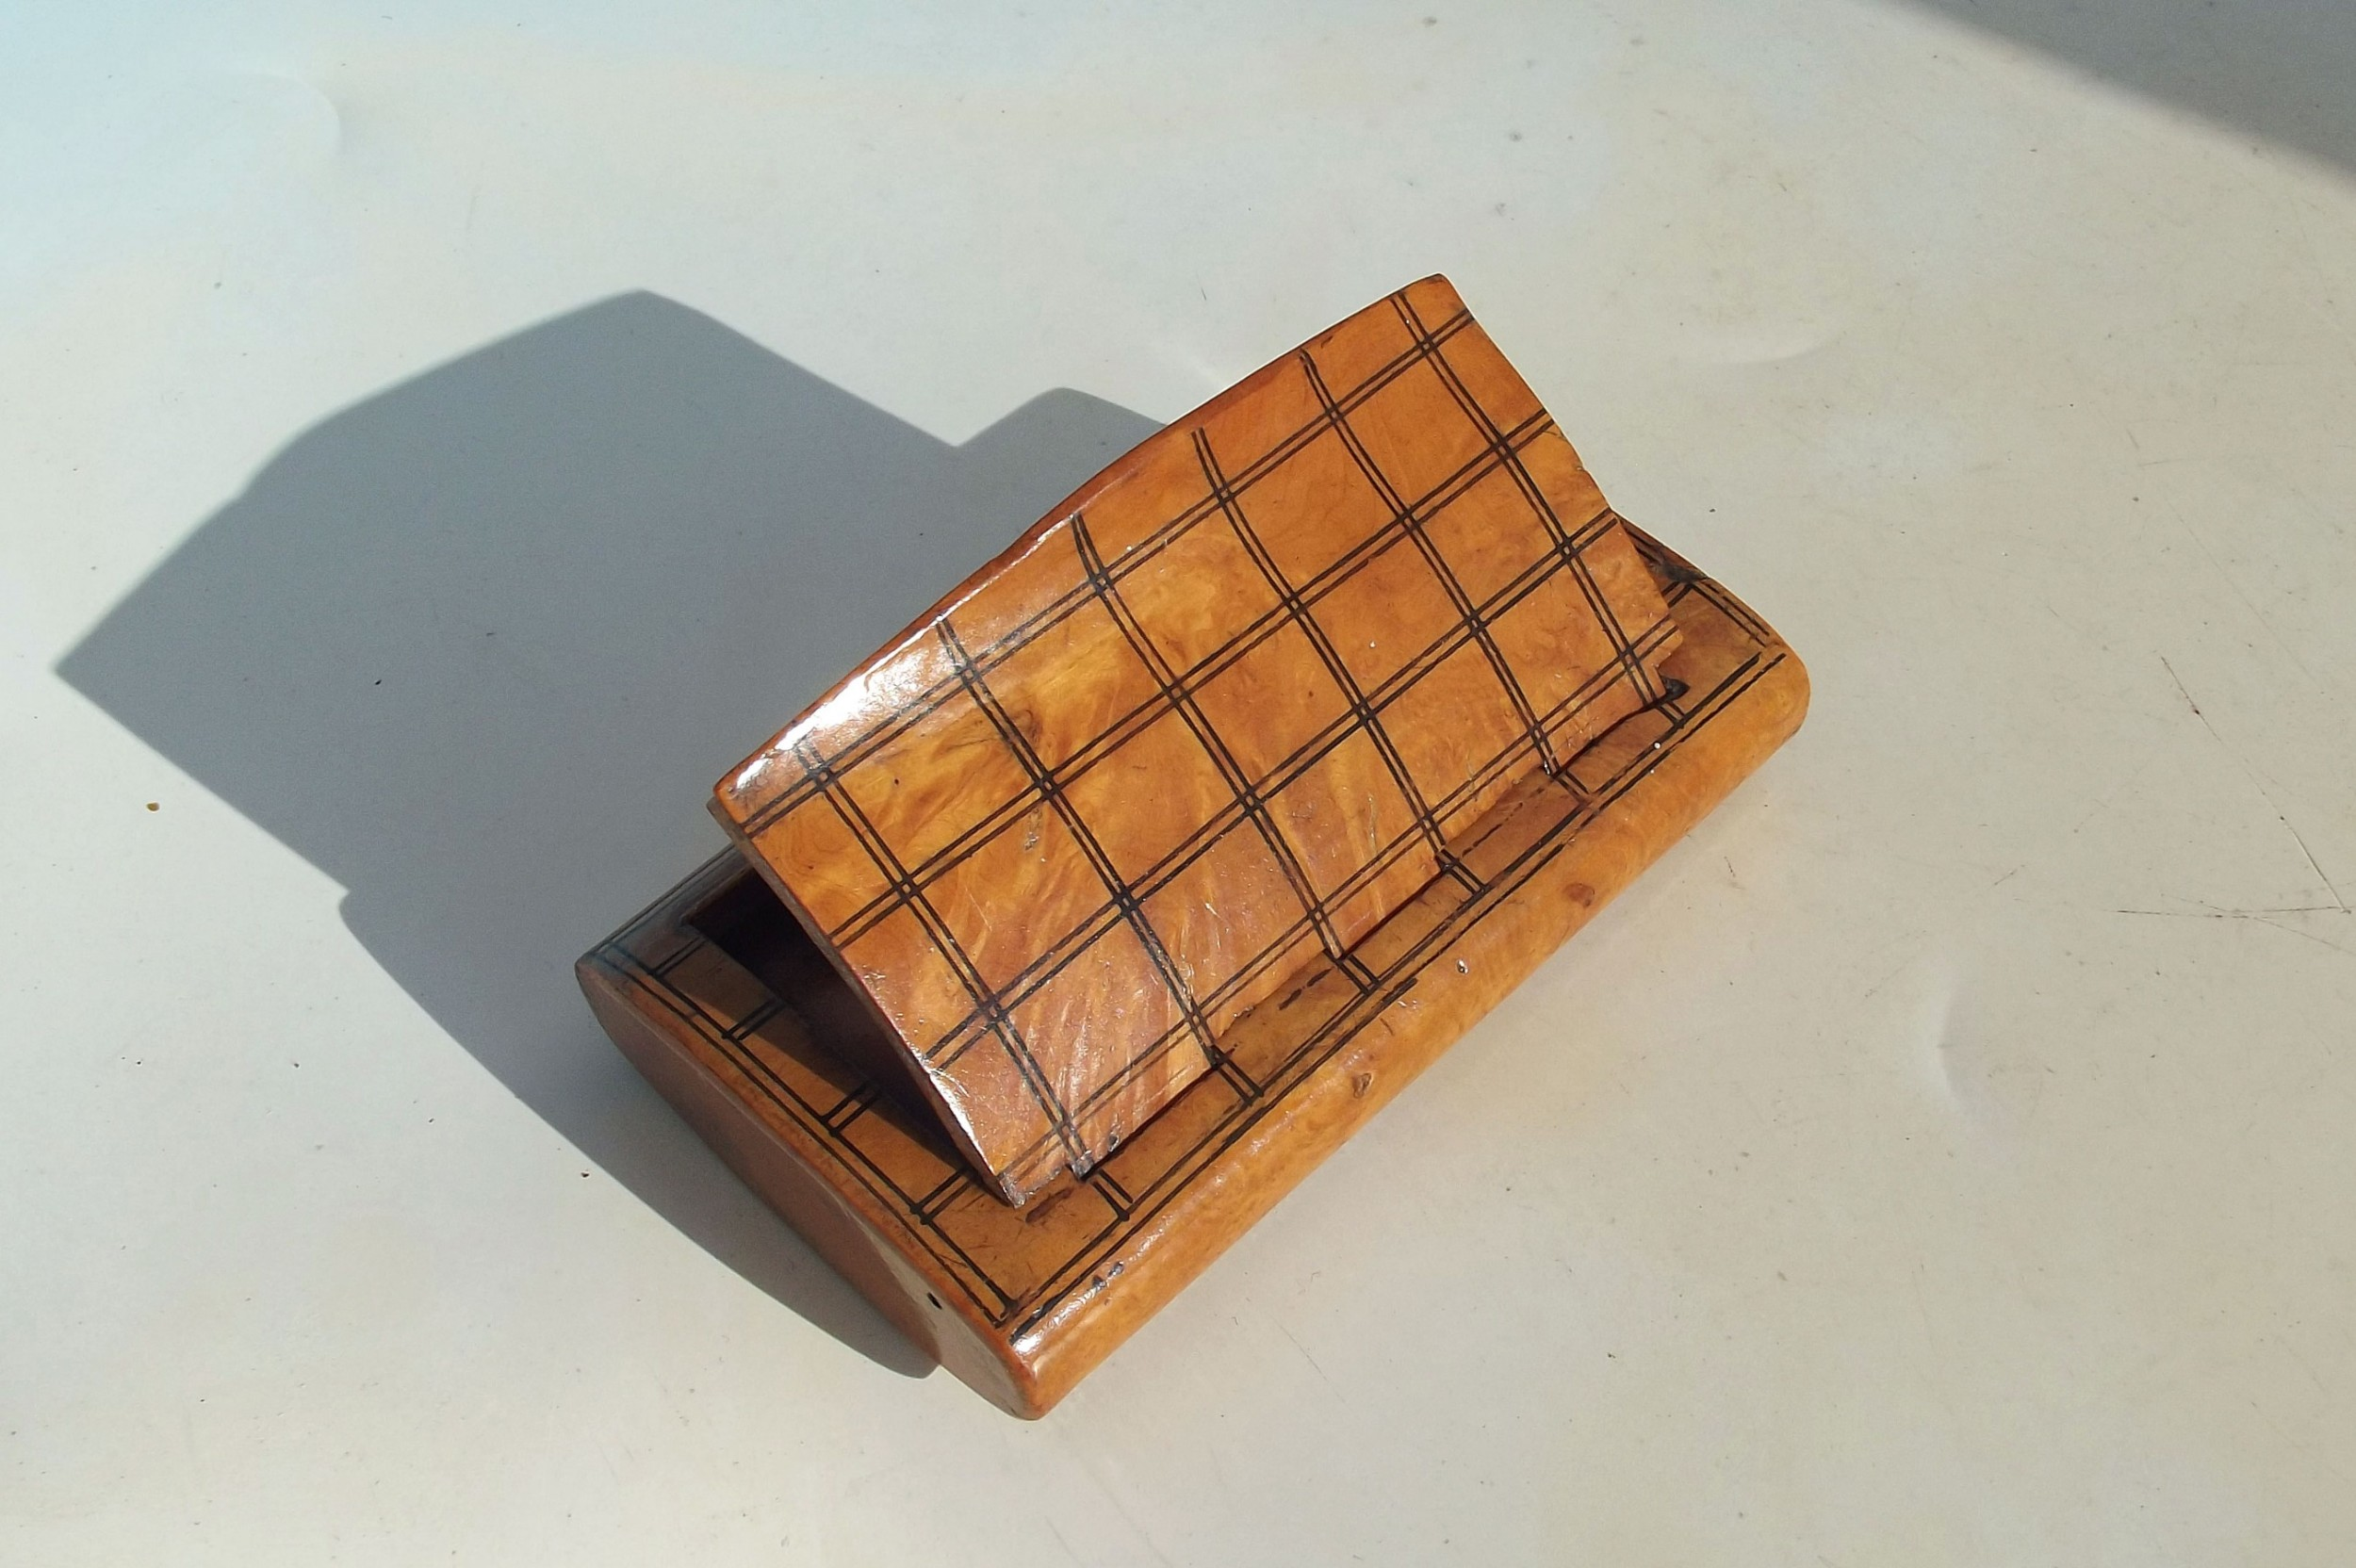 antique treen 19thc chequered pattern birch snuff box continental c184060